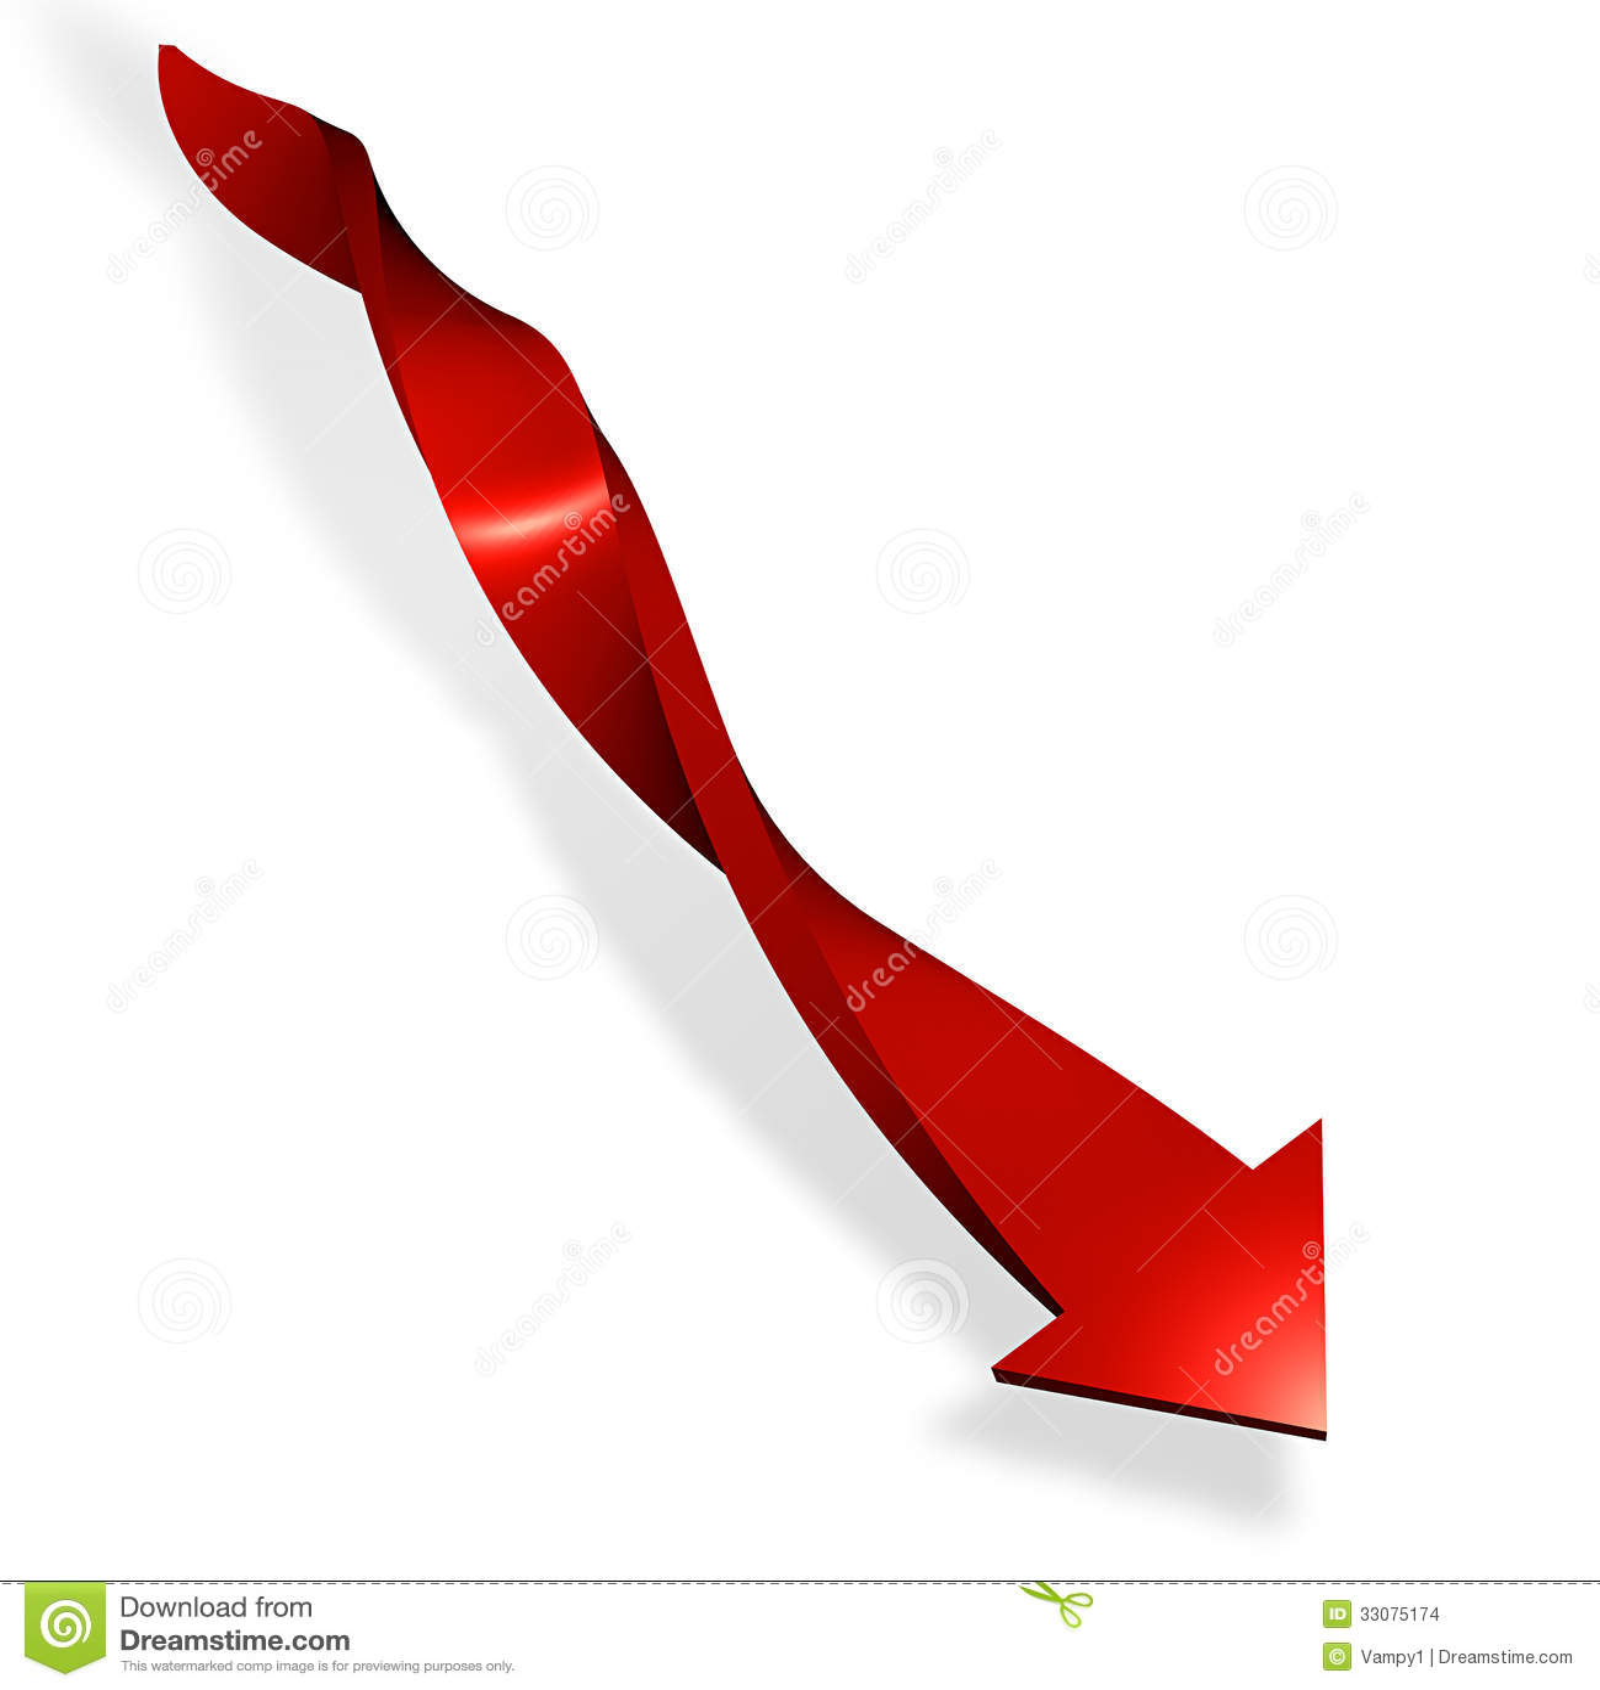 Green Arrow Red Arrow Down